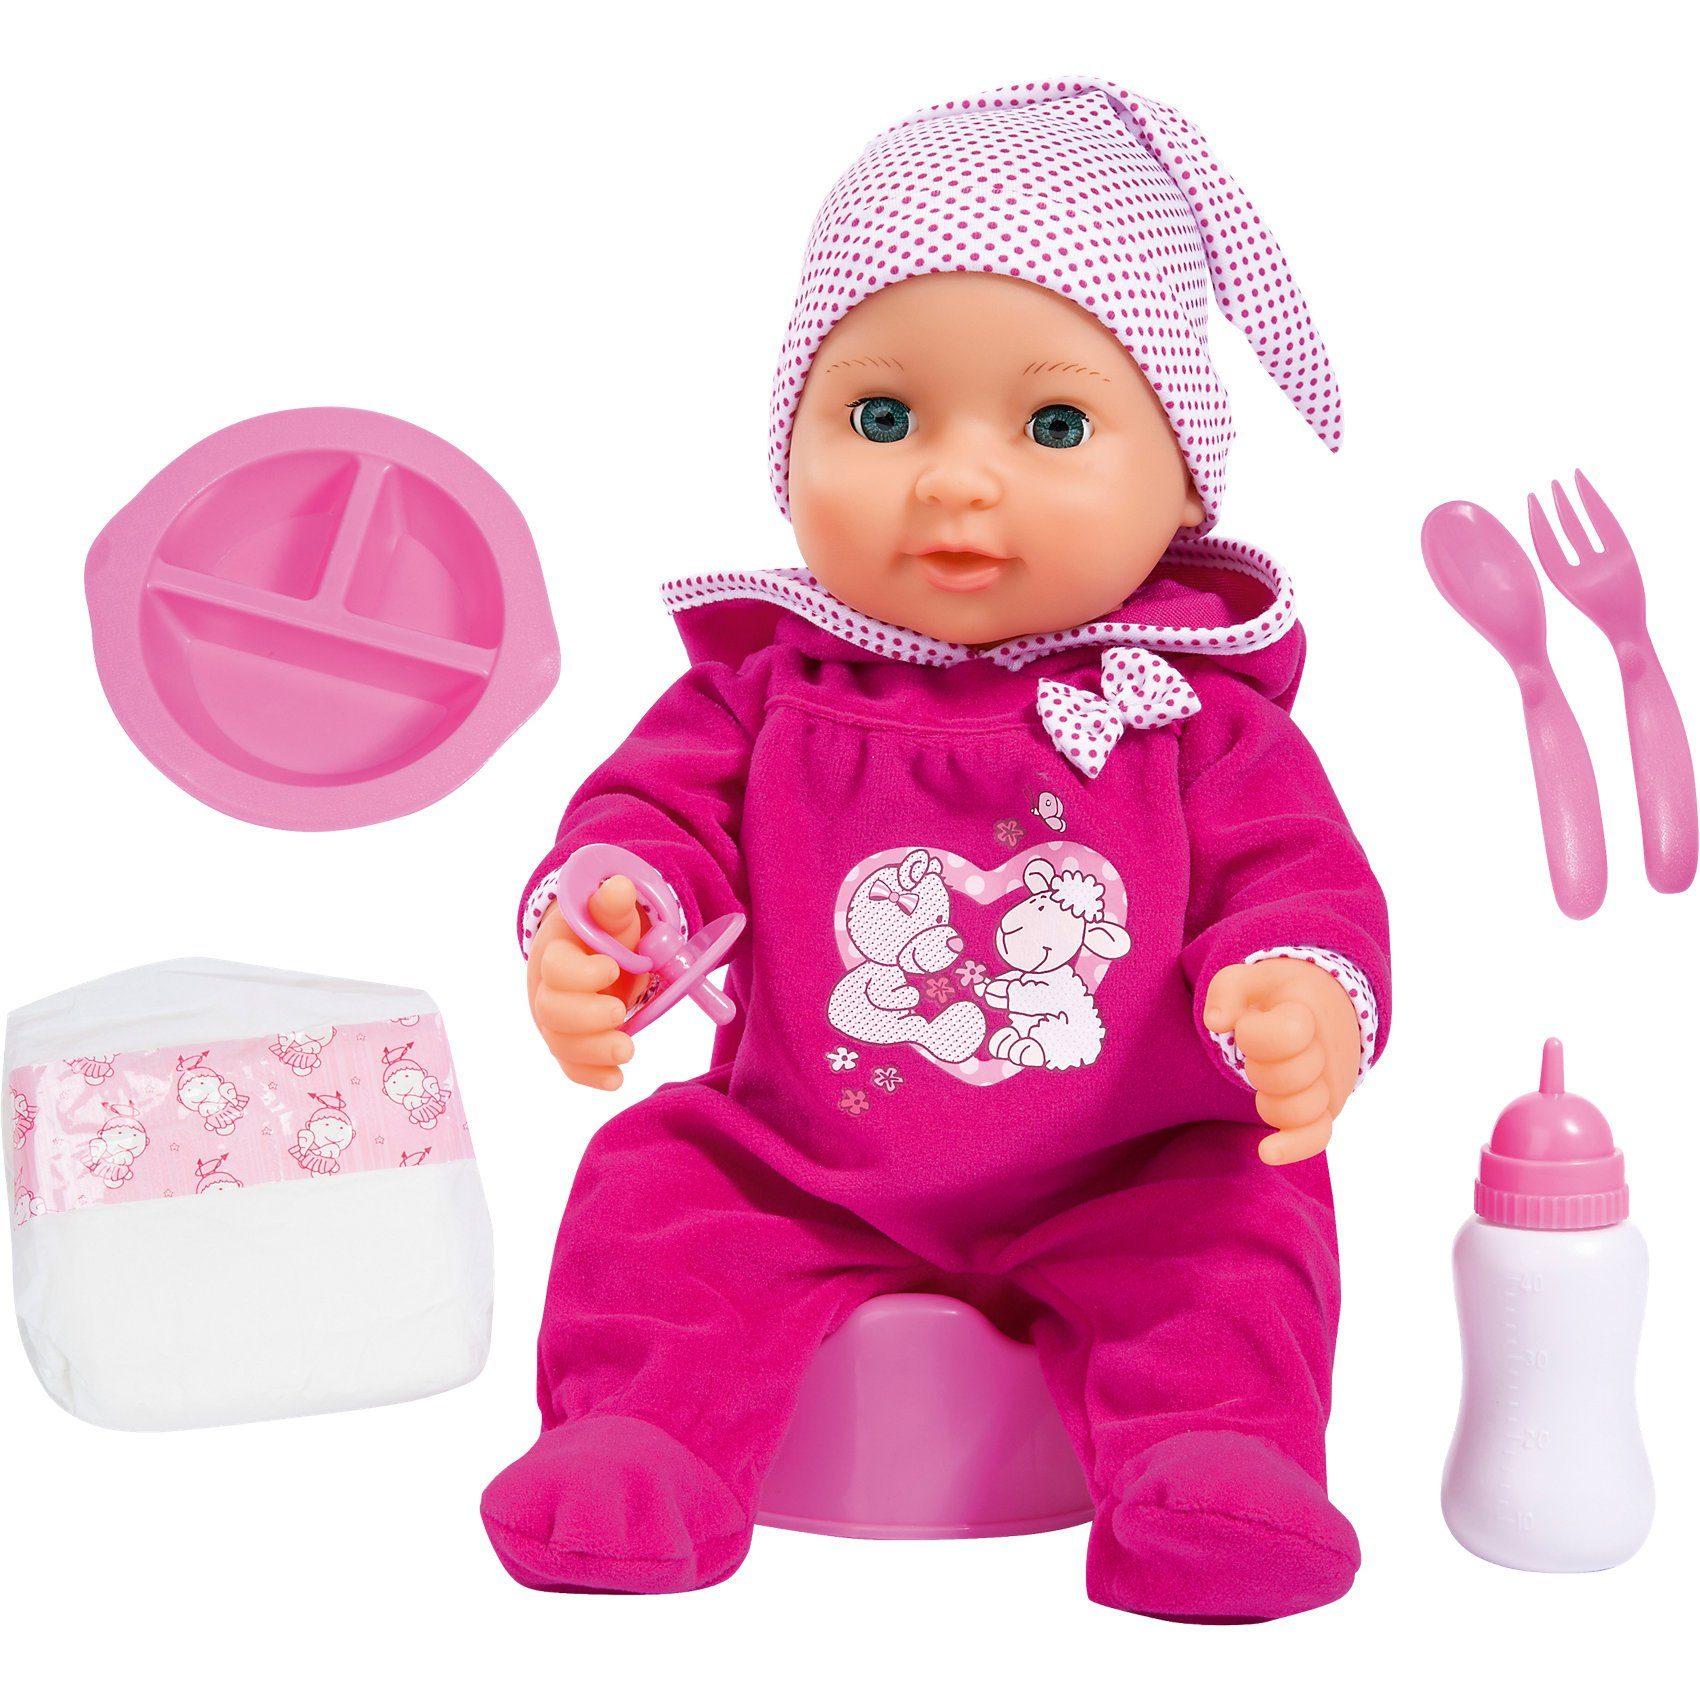 Bayer Babypuppe Piccolina Newborn Baby 40 cm